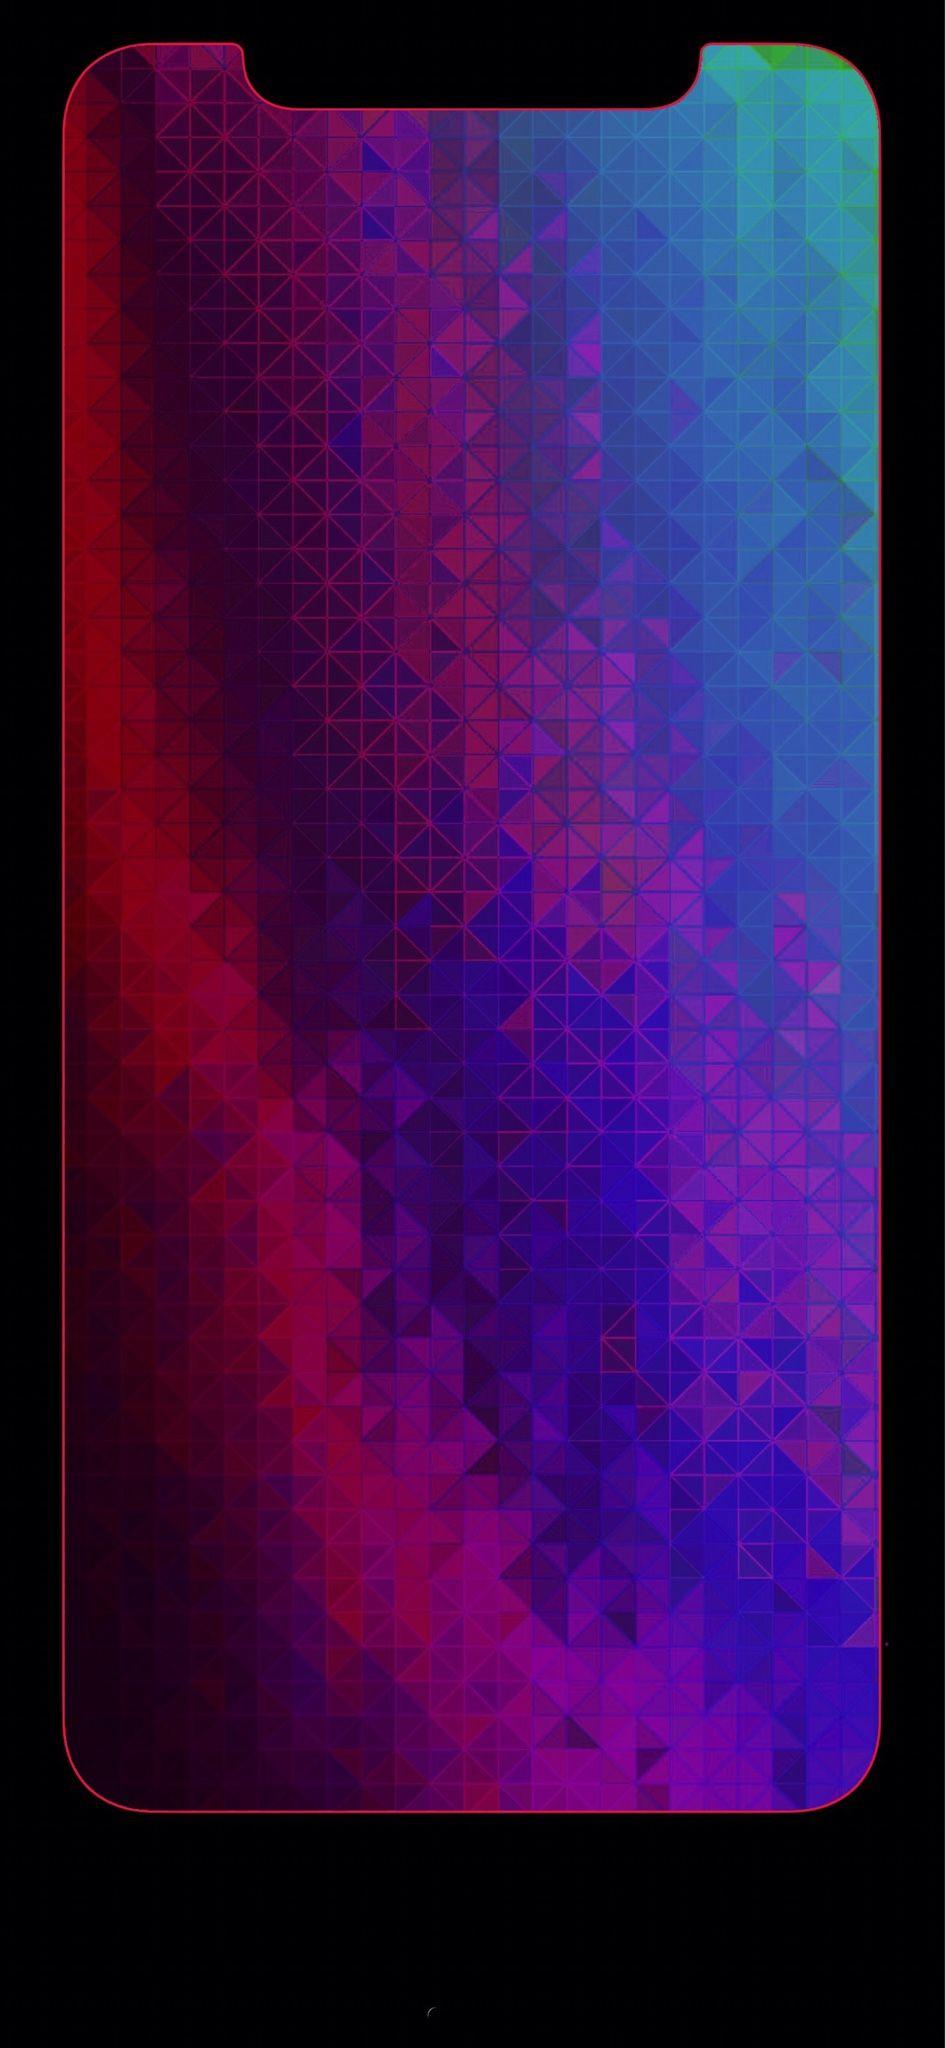 Iphone image by Deon Van Der Merwe on iphone x wallpaper